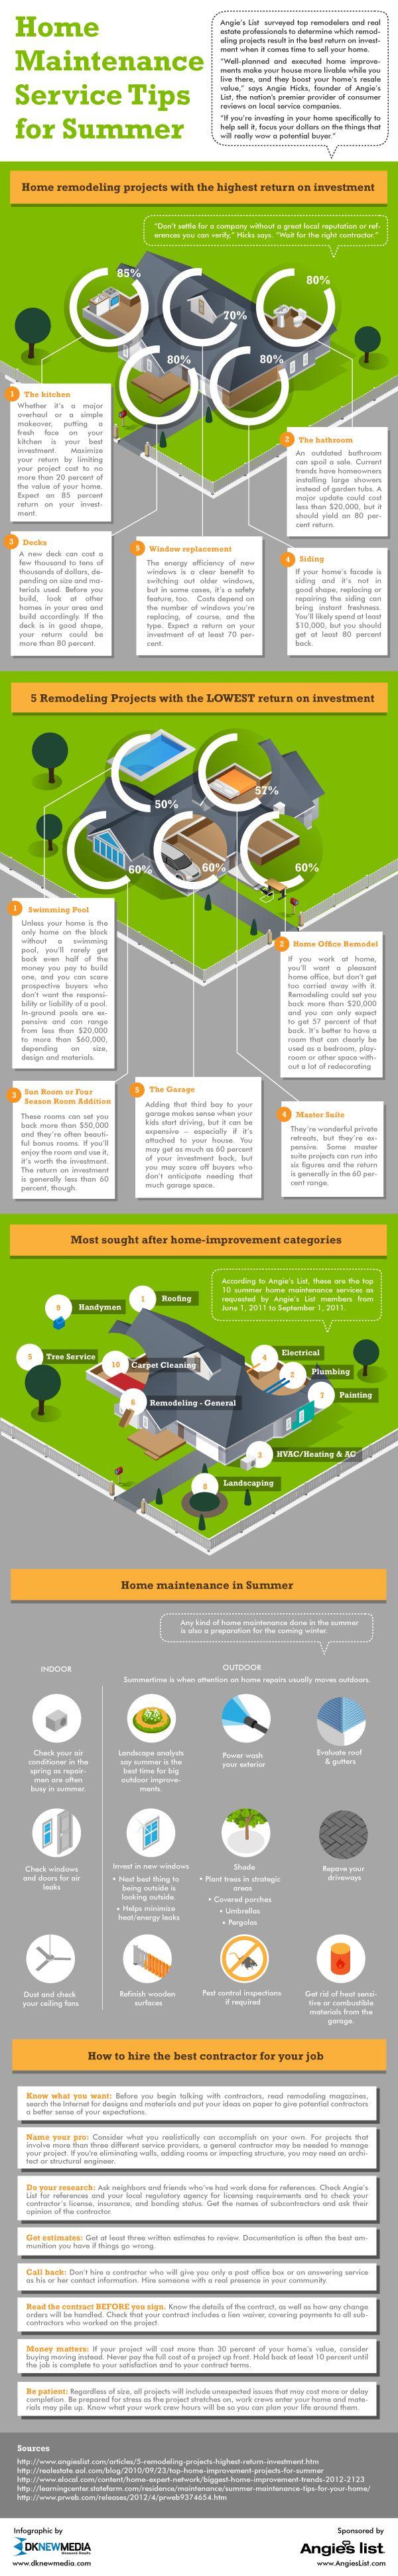 Basement renovation return on investment - Home Maintenance Service Tips For Summer